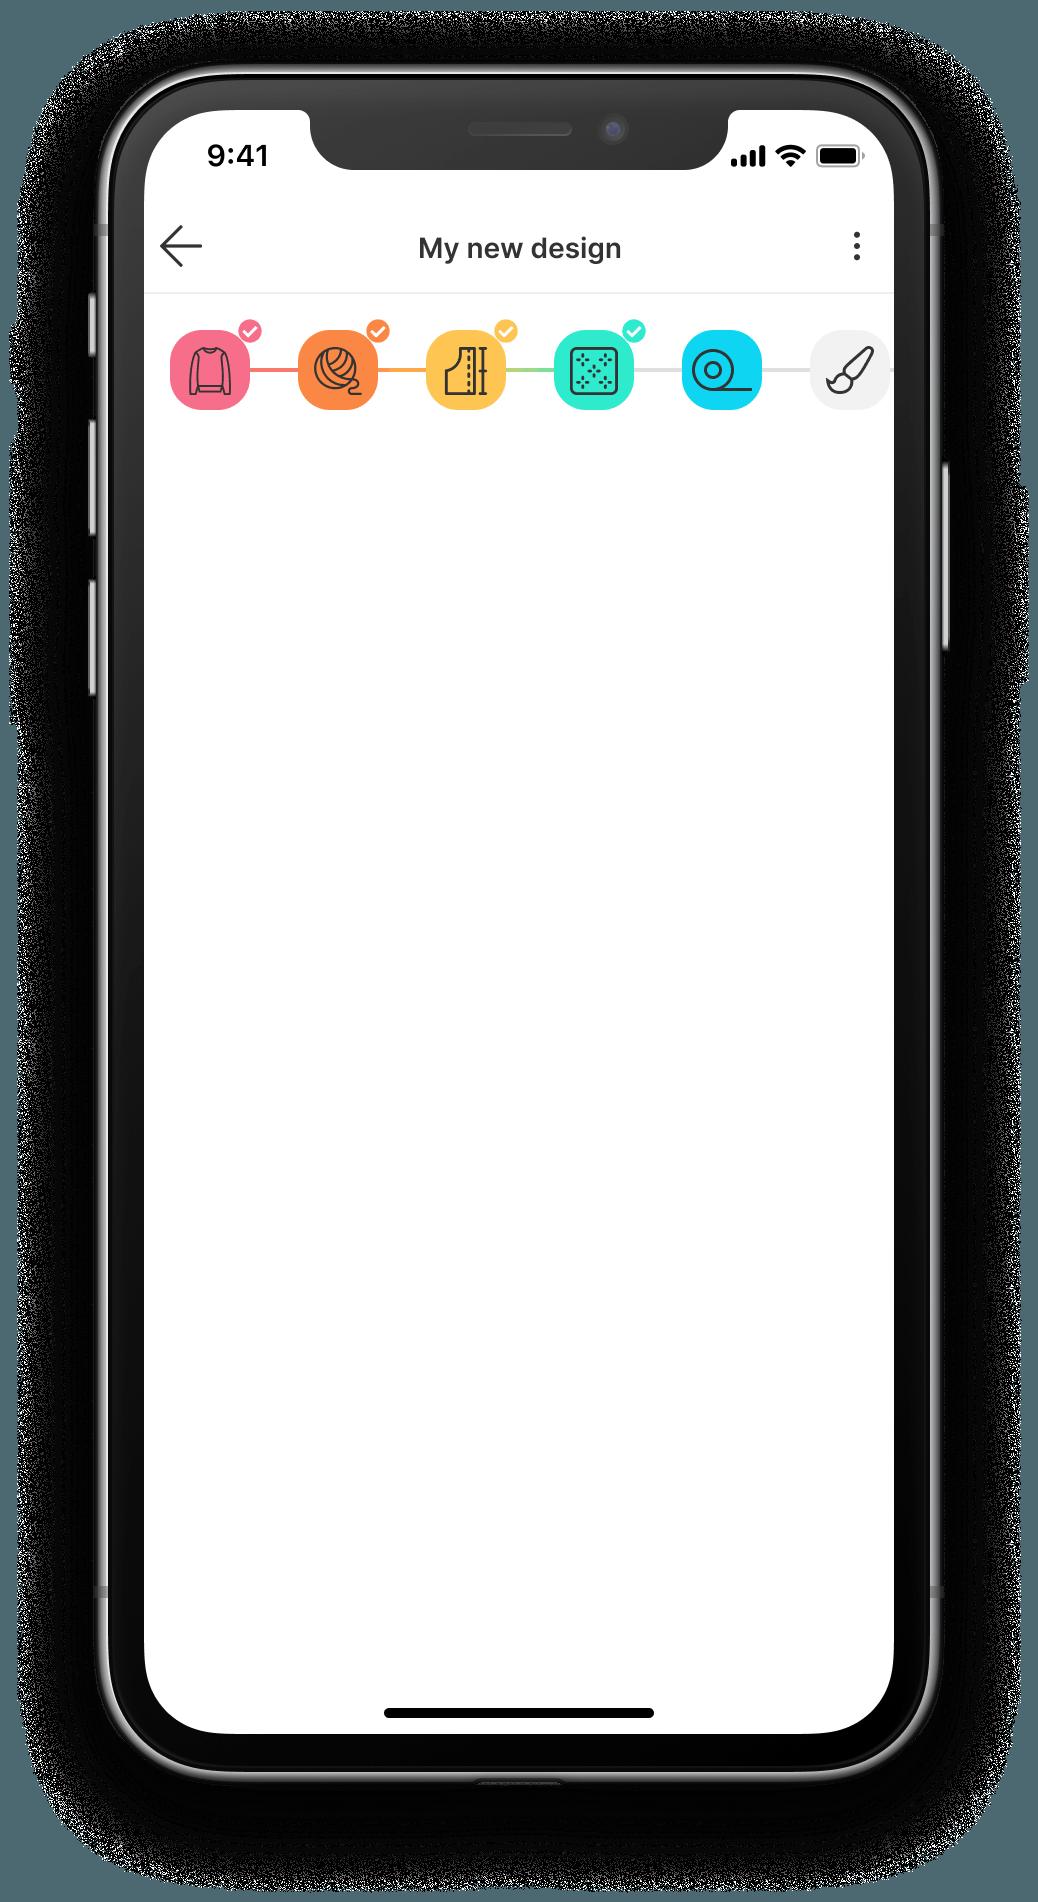 Bellish iPhone app screen pattern designer with scrolling raglan sweaters